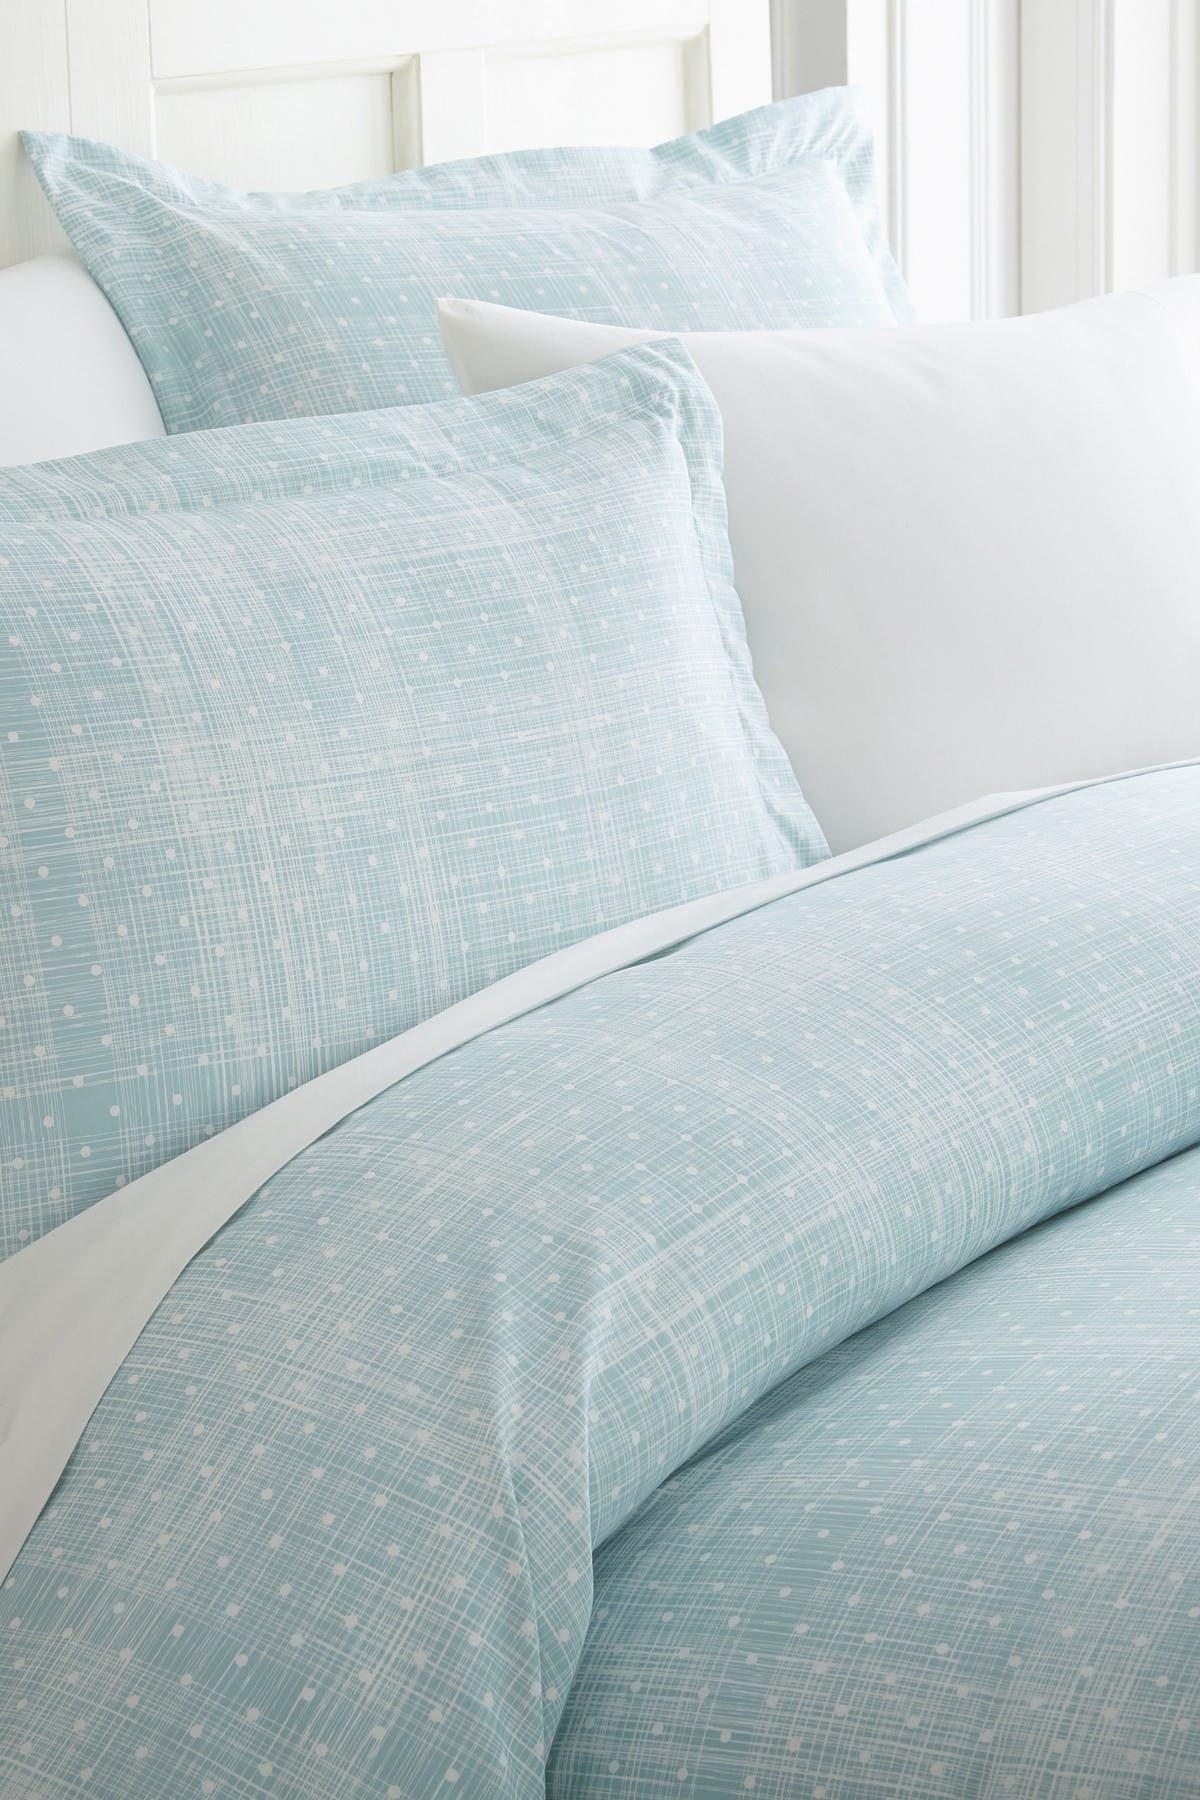 Ienjoy Home Home Spun Premium Ultra Soft Polka Dot Pattern 3-piece Duvet Cover Full/queen Set In Aqua